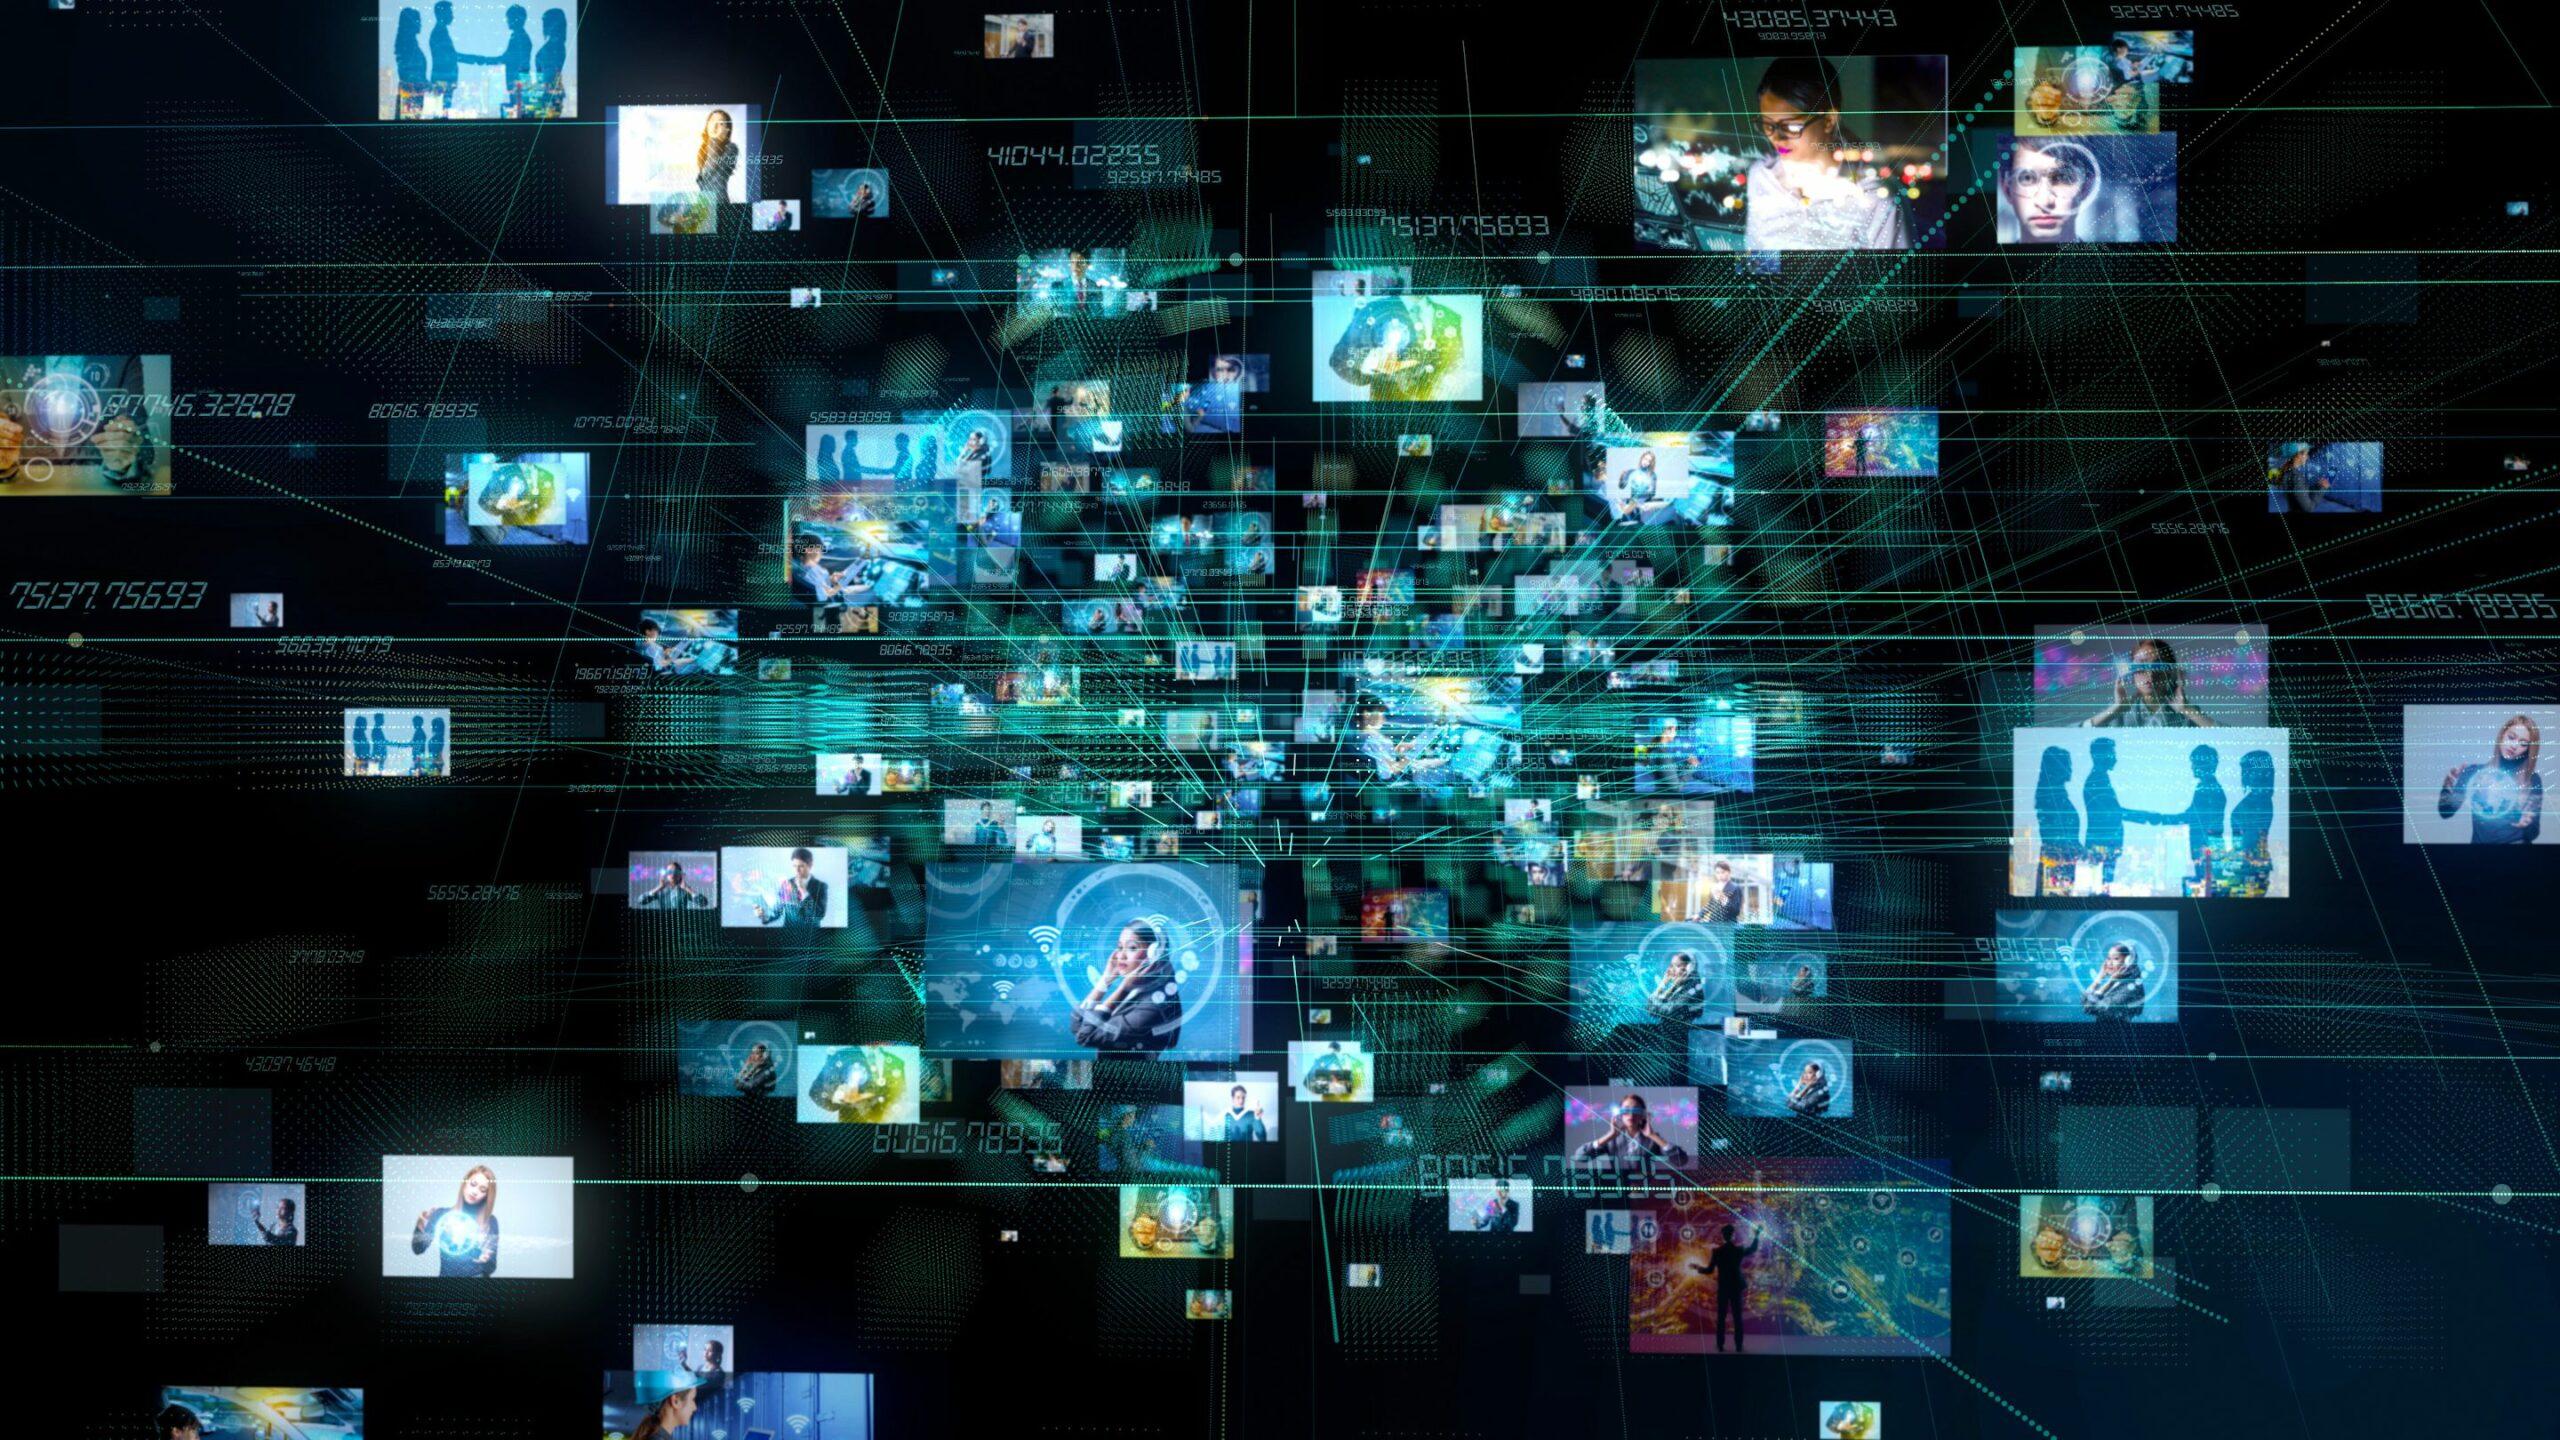 Advantages of Video Analytics